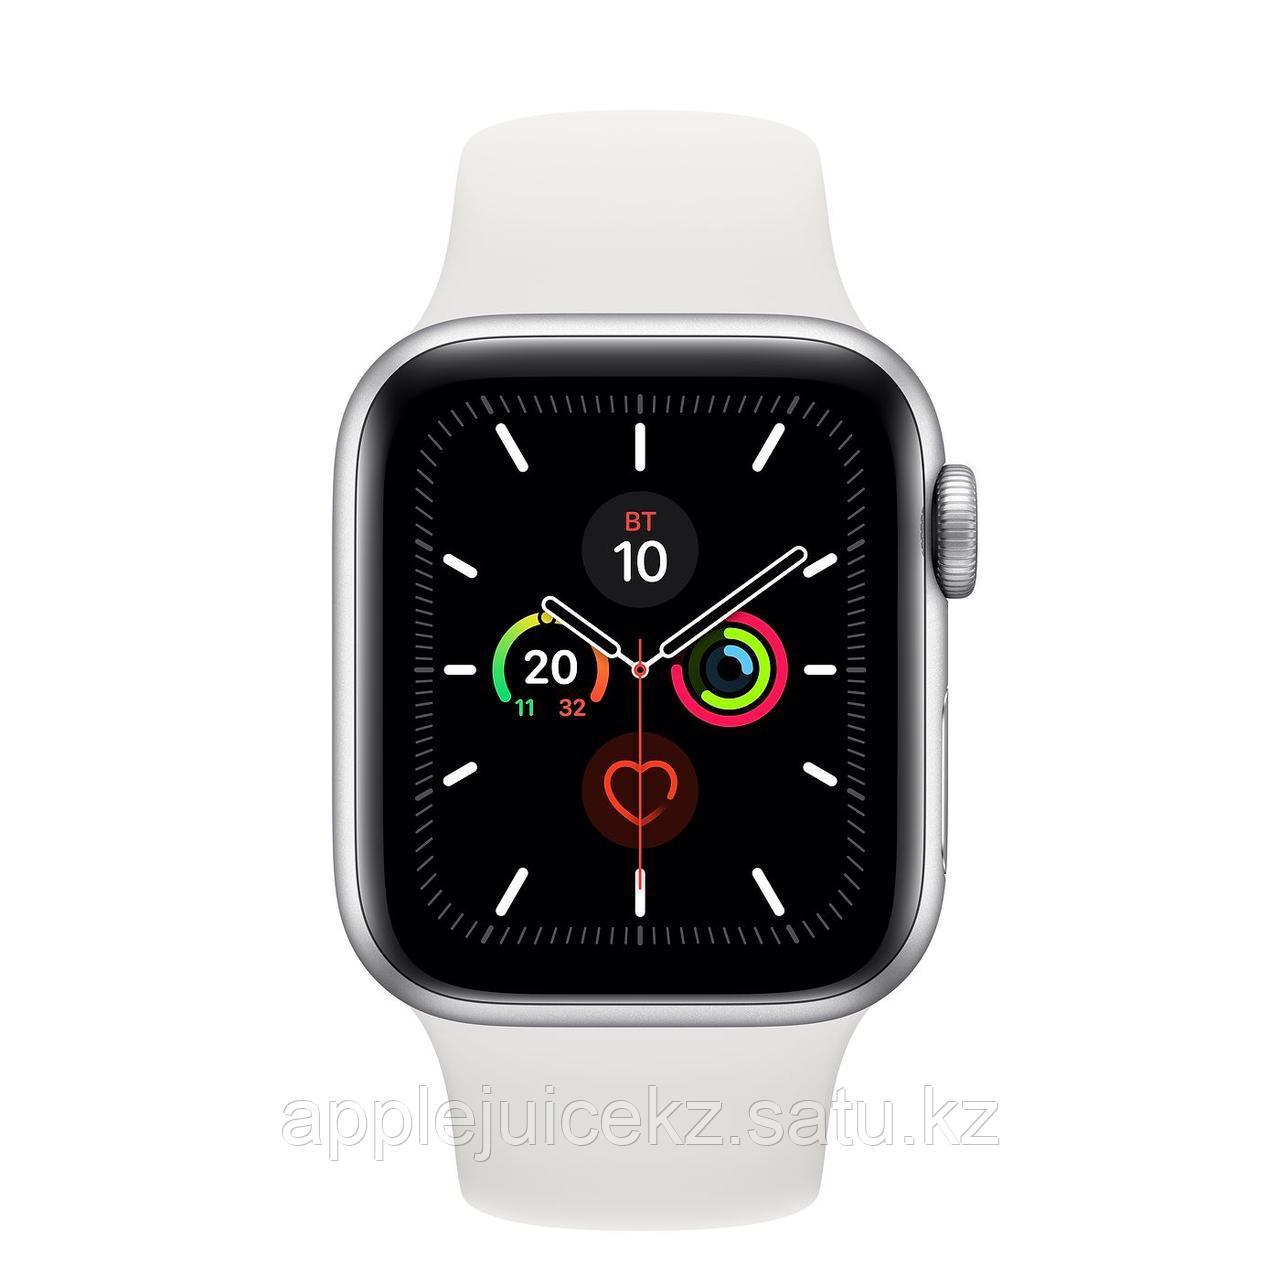 Apple Watch Series 5, GPS, корпус 40 мм, алюминий серебристого цвета, спортивный ремешок белого цвета,